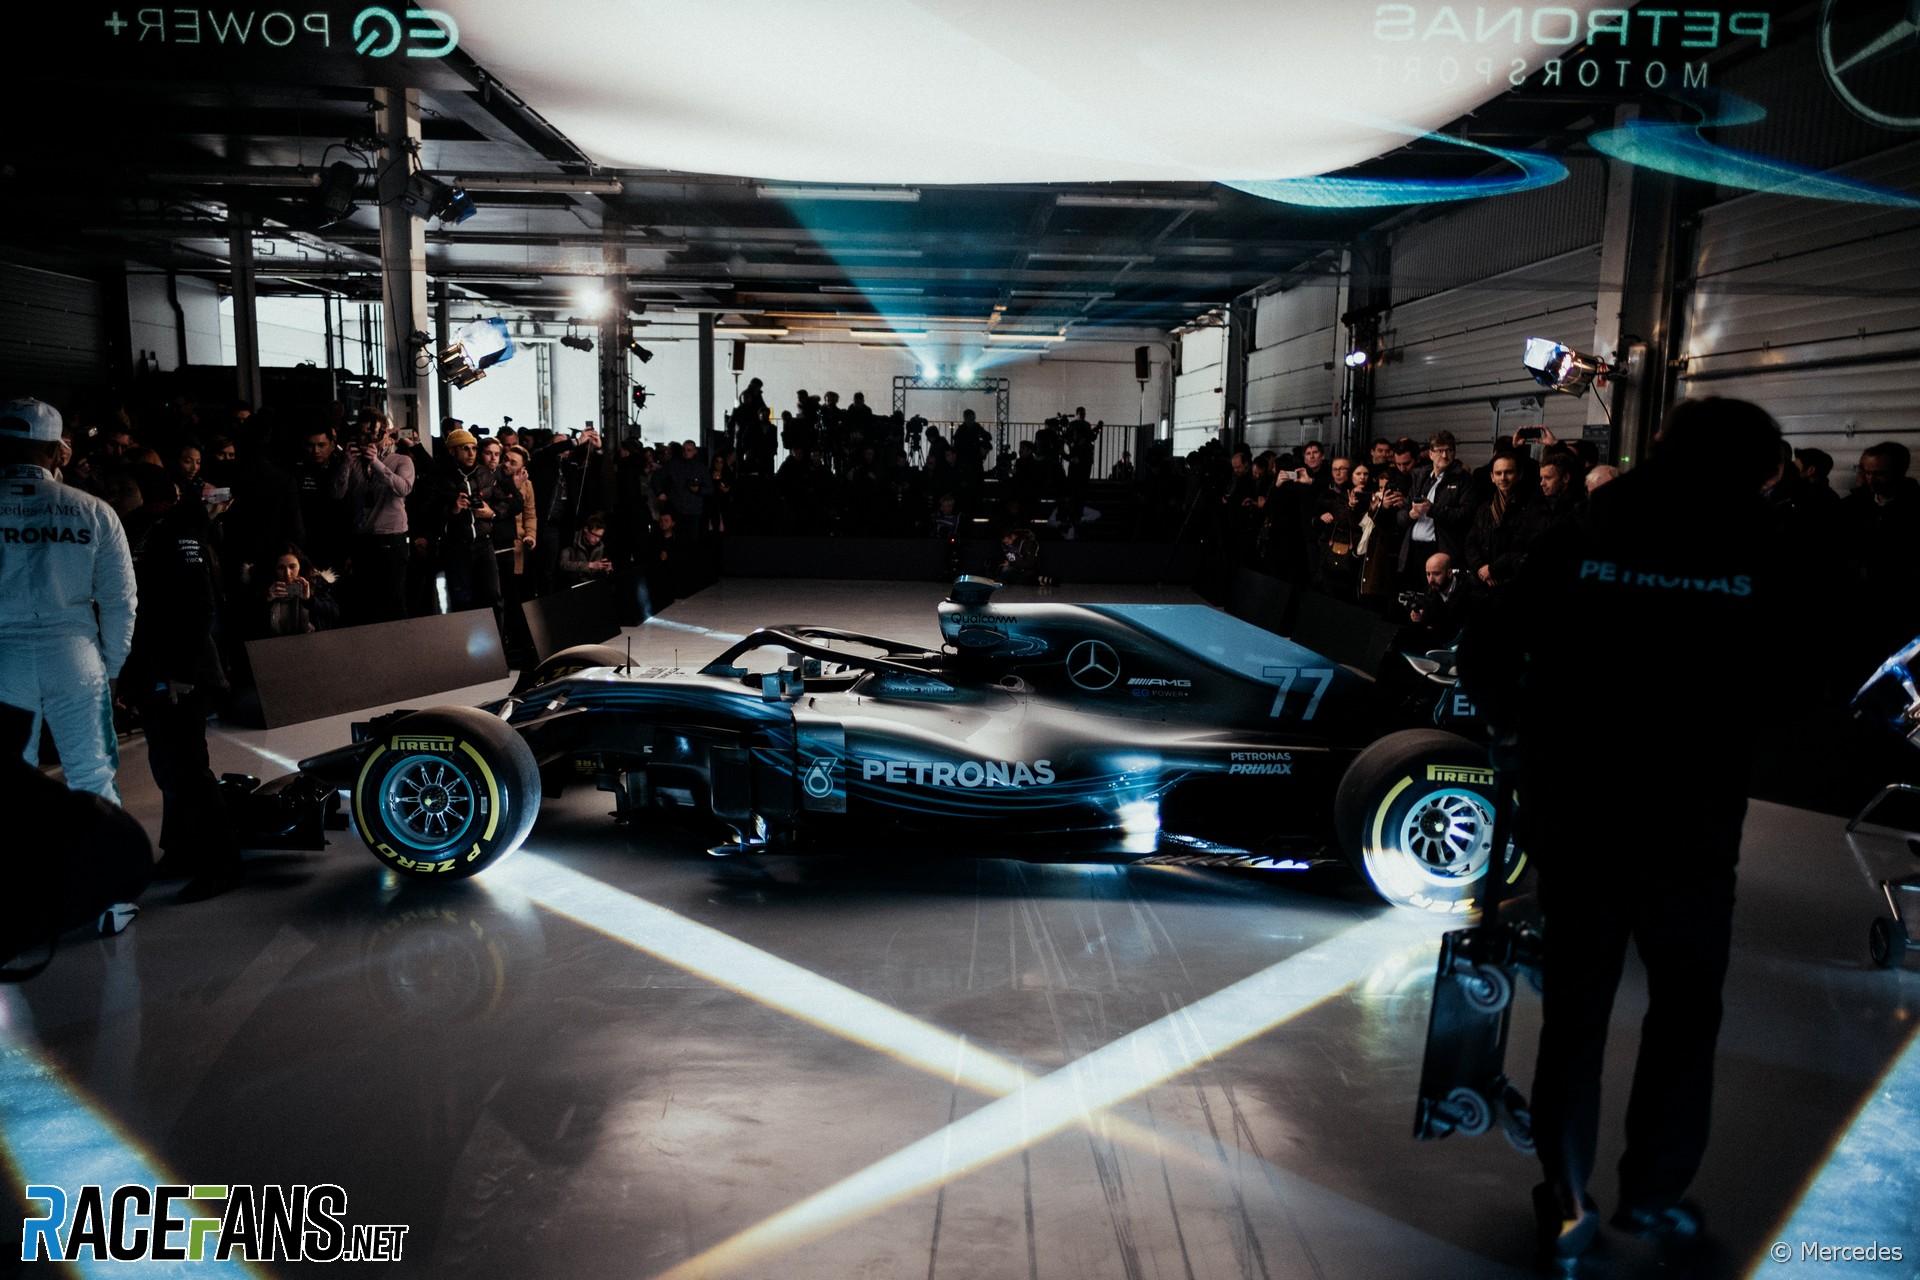 Mercedes W09 launch, Silverstone, 2018